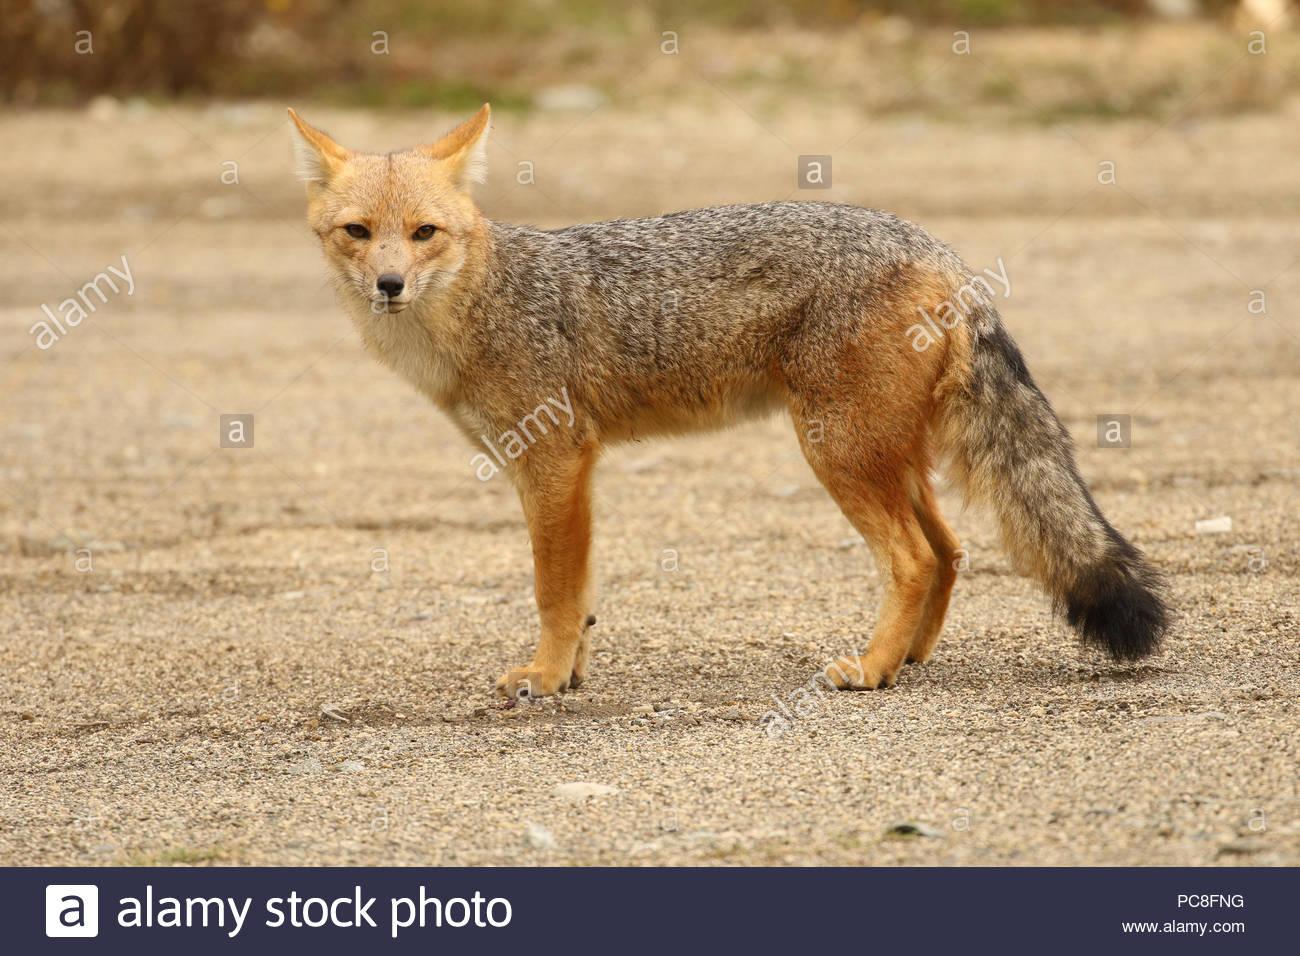 A culpeo or Andean fox, Lycalopex culpaeus, staring alertly - Stock Image